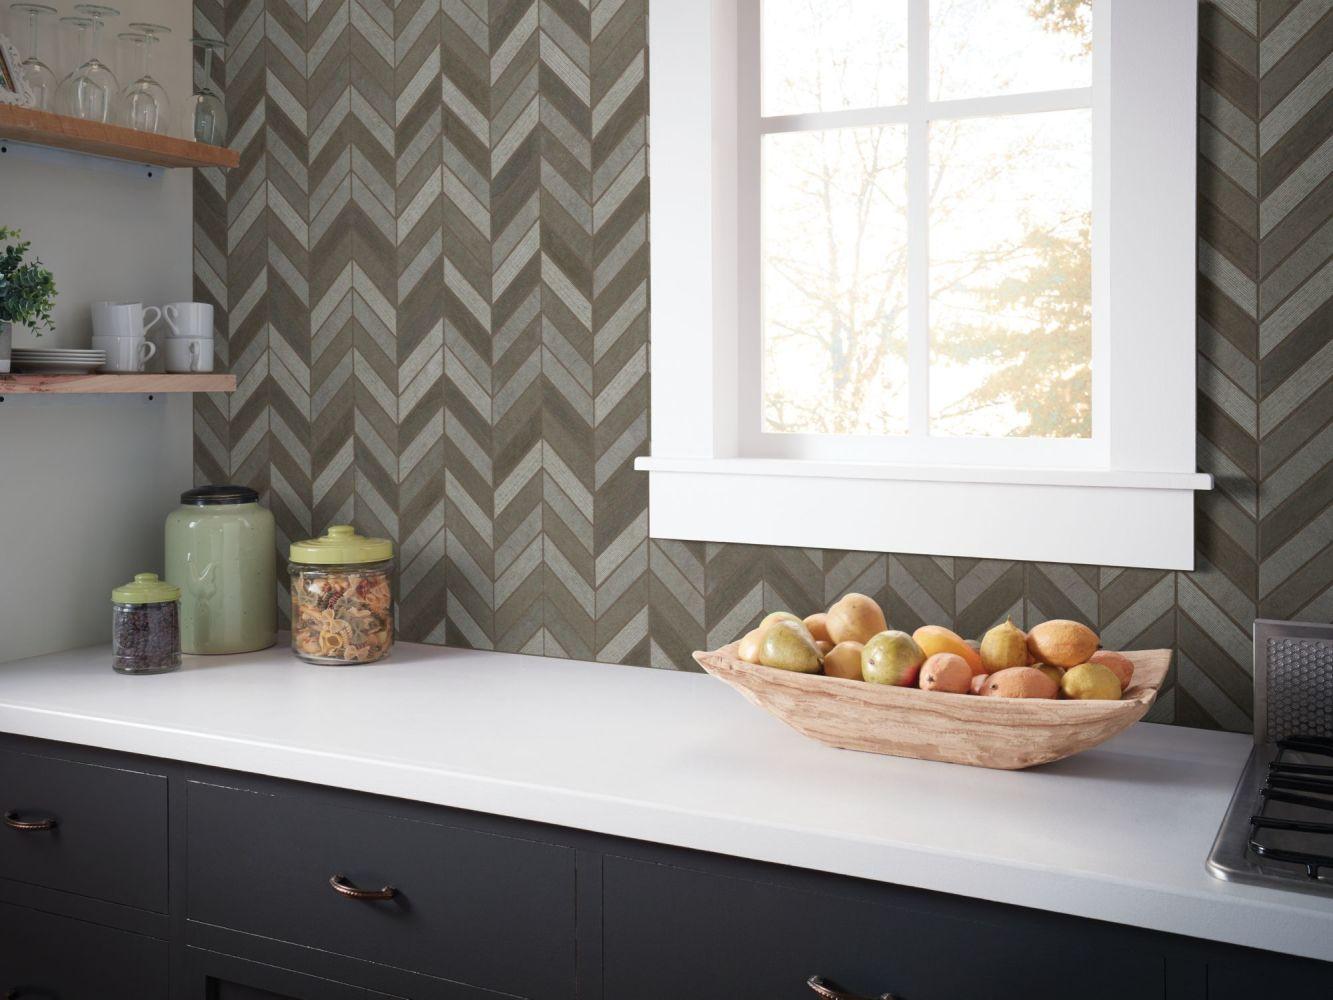 Shaw Floors Home Fn Gold Ceramic Del Ray Chevron Foussana Gray 00530_TG43C